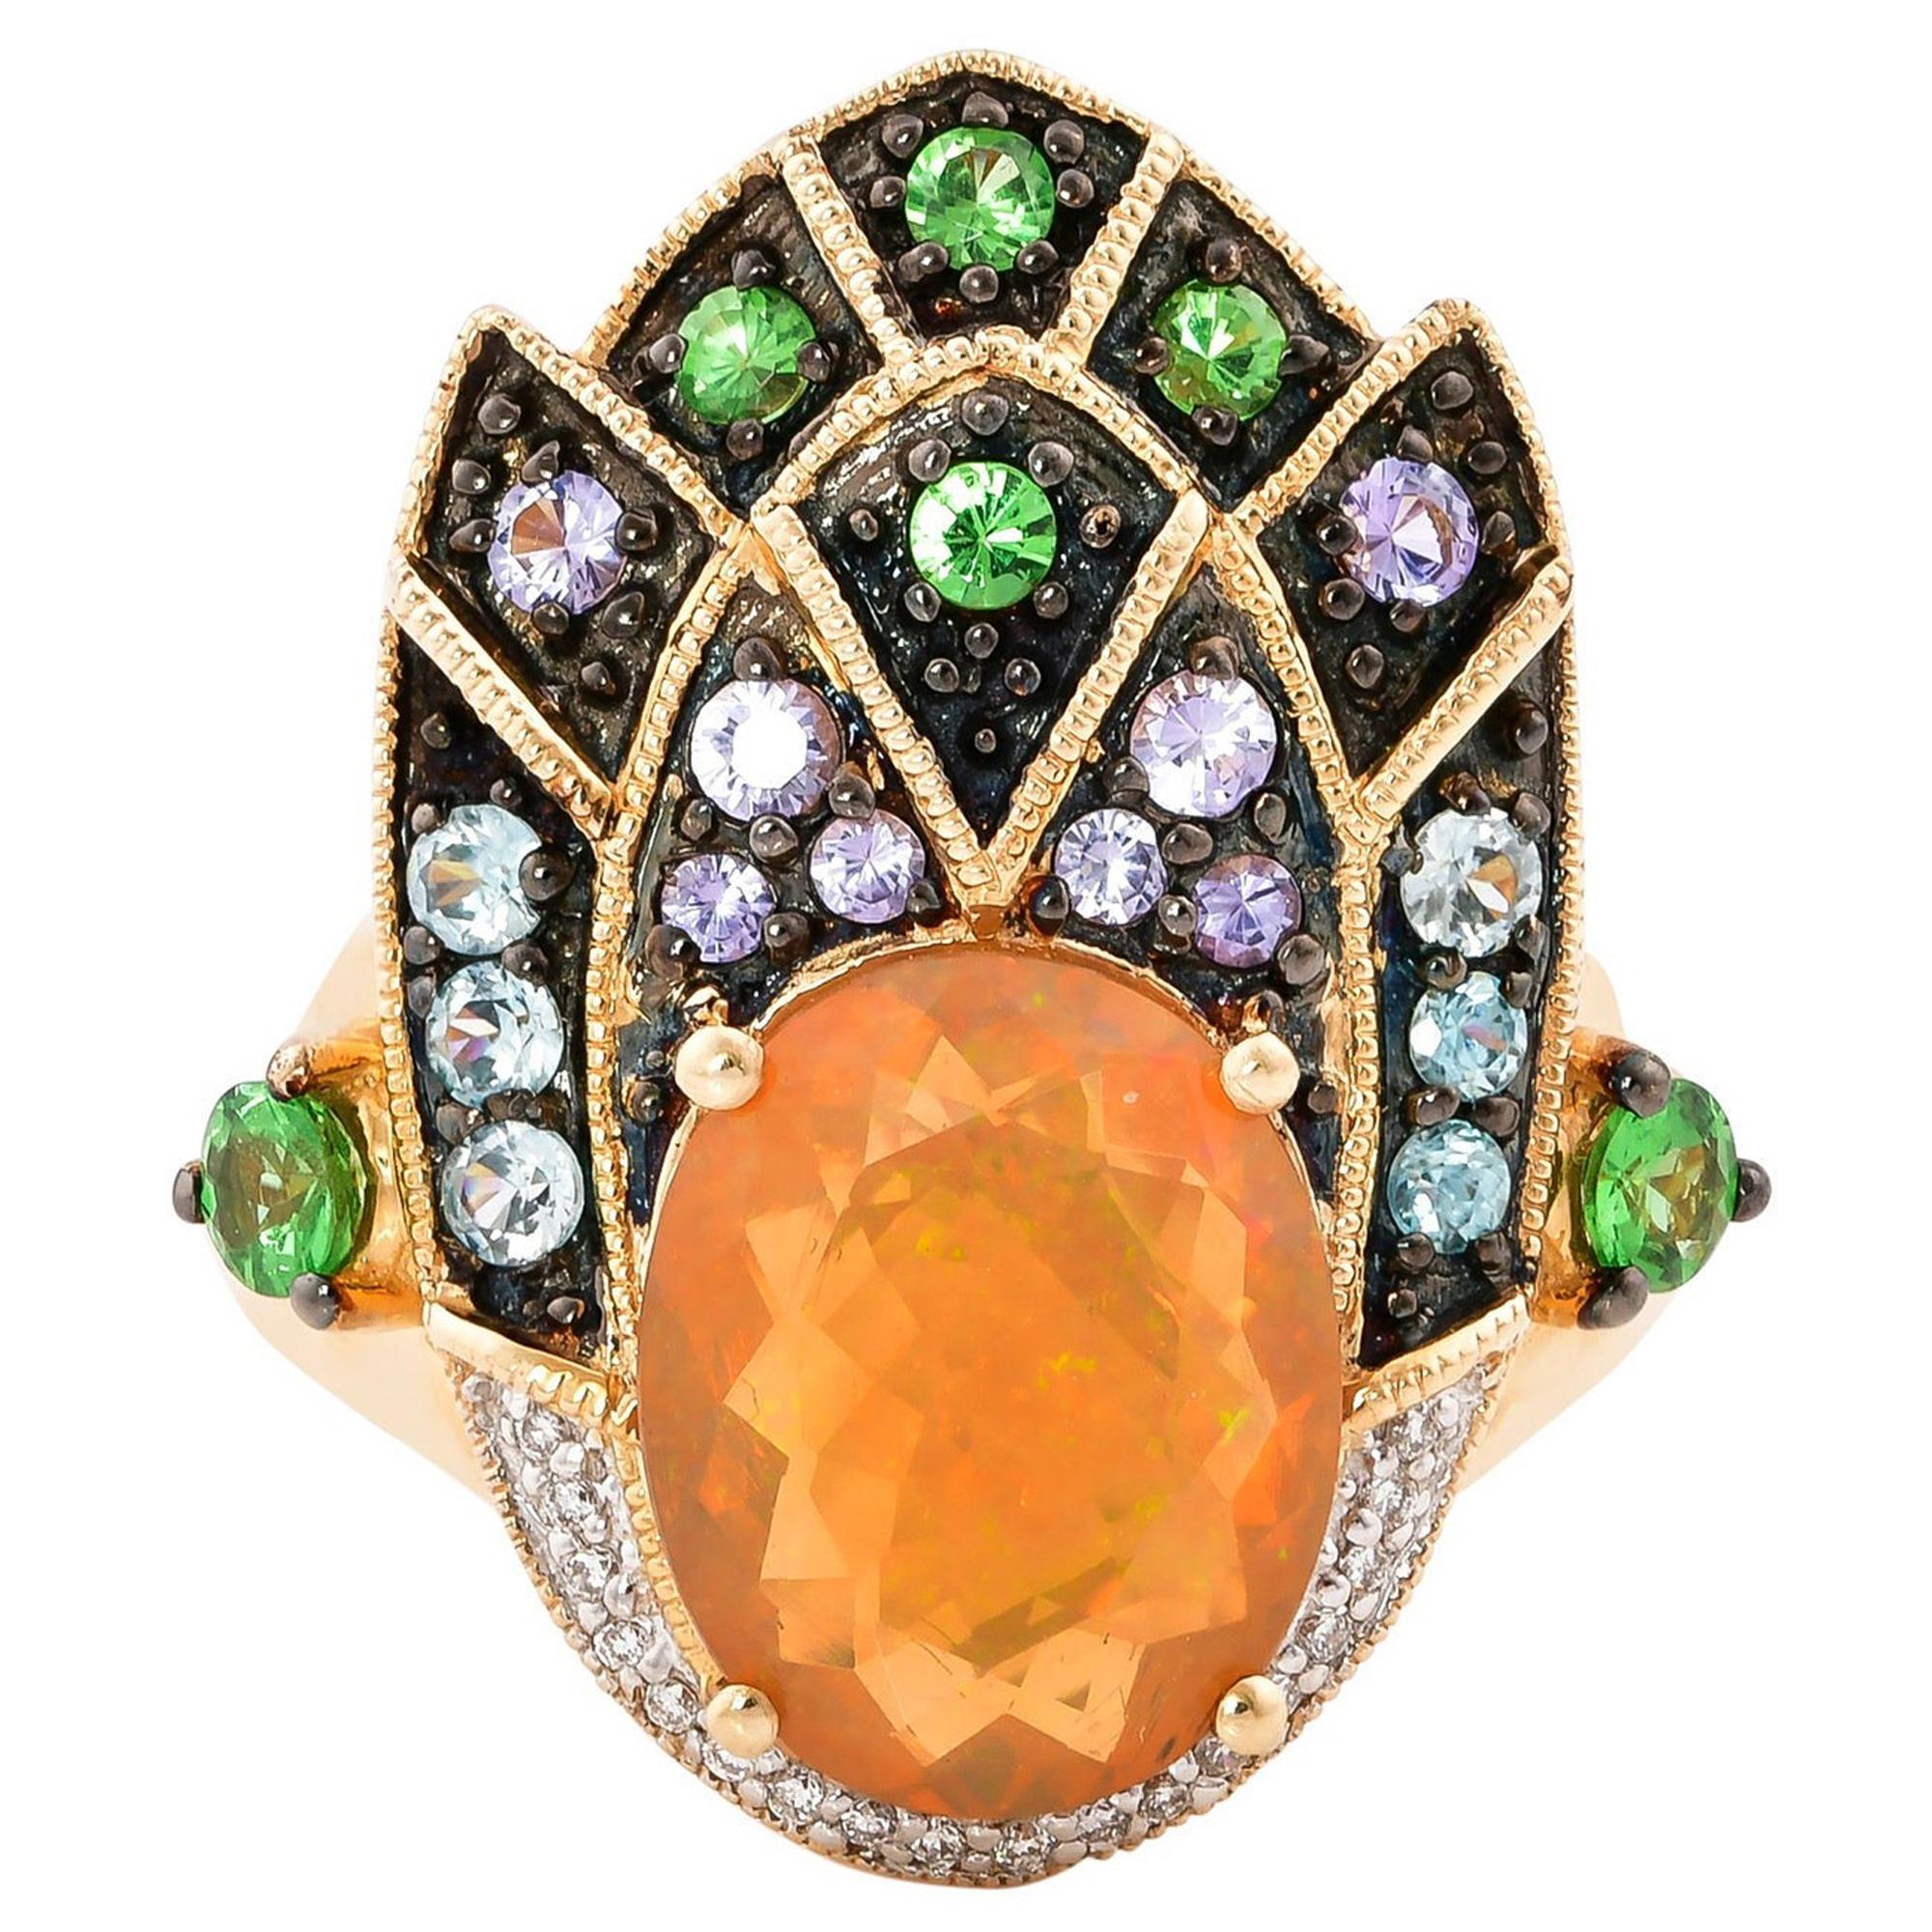 2.22 Carat Ethiopian Opal Ring in 14 Karat Yellow Gold with Diamonds